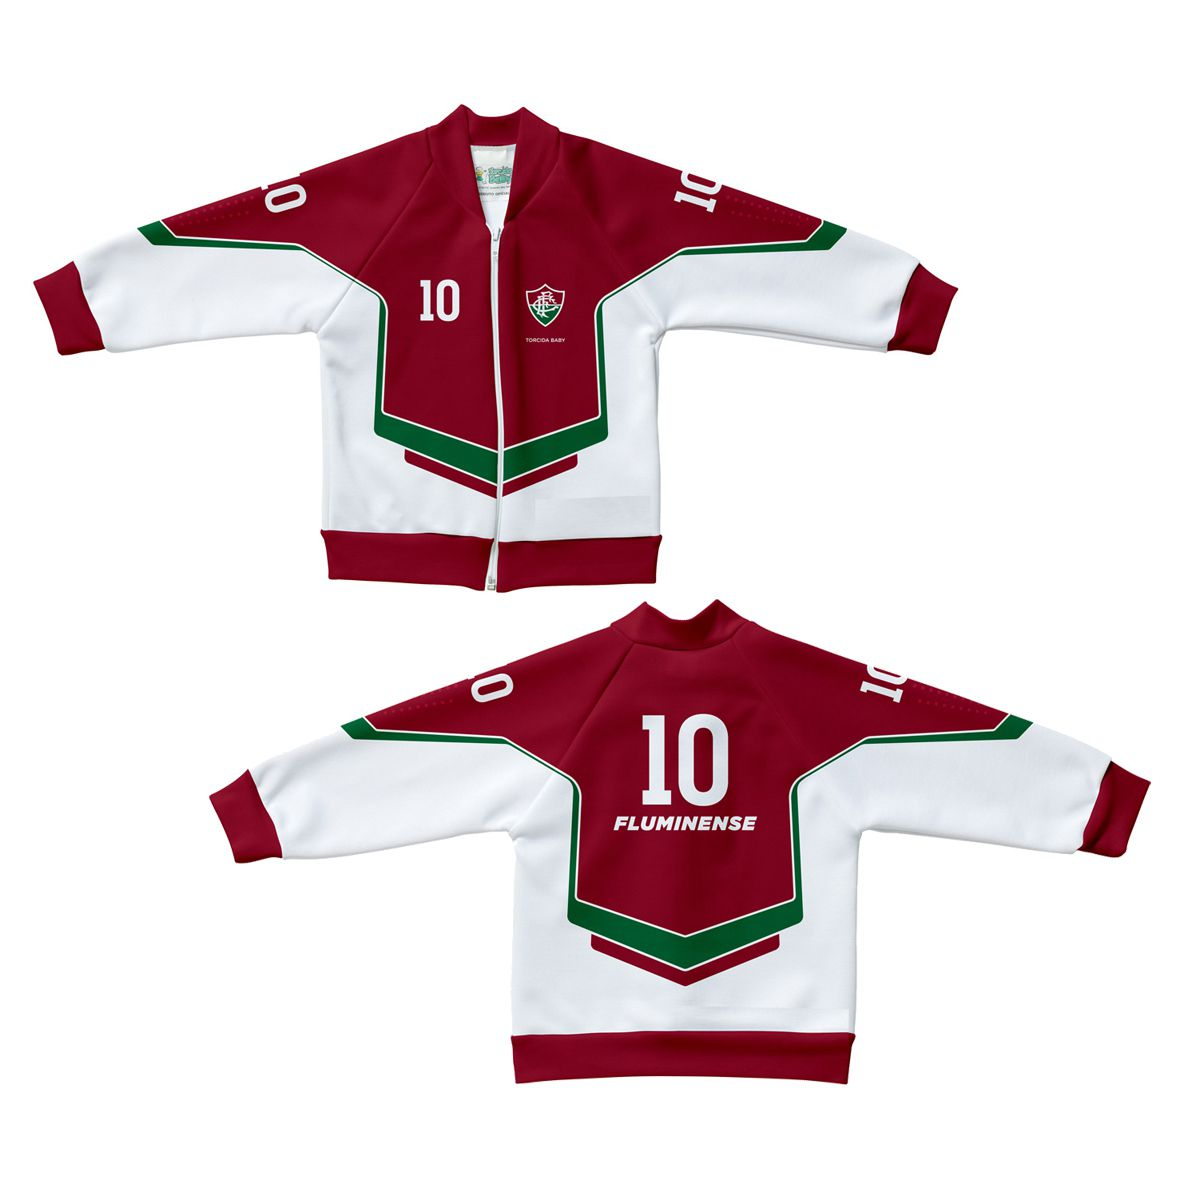 Jaqueta Infantil do Fluminense Malha Esportiva Estilo - 224S